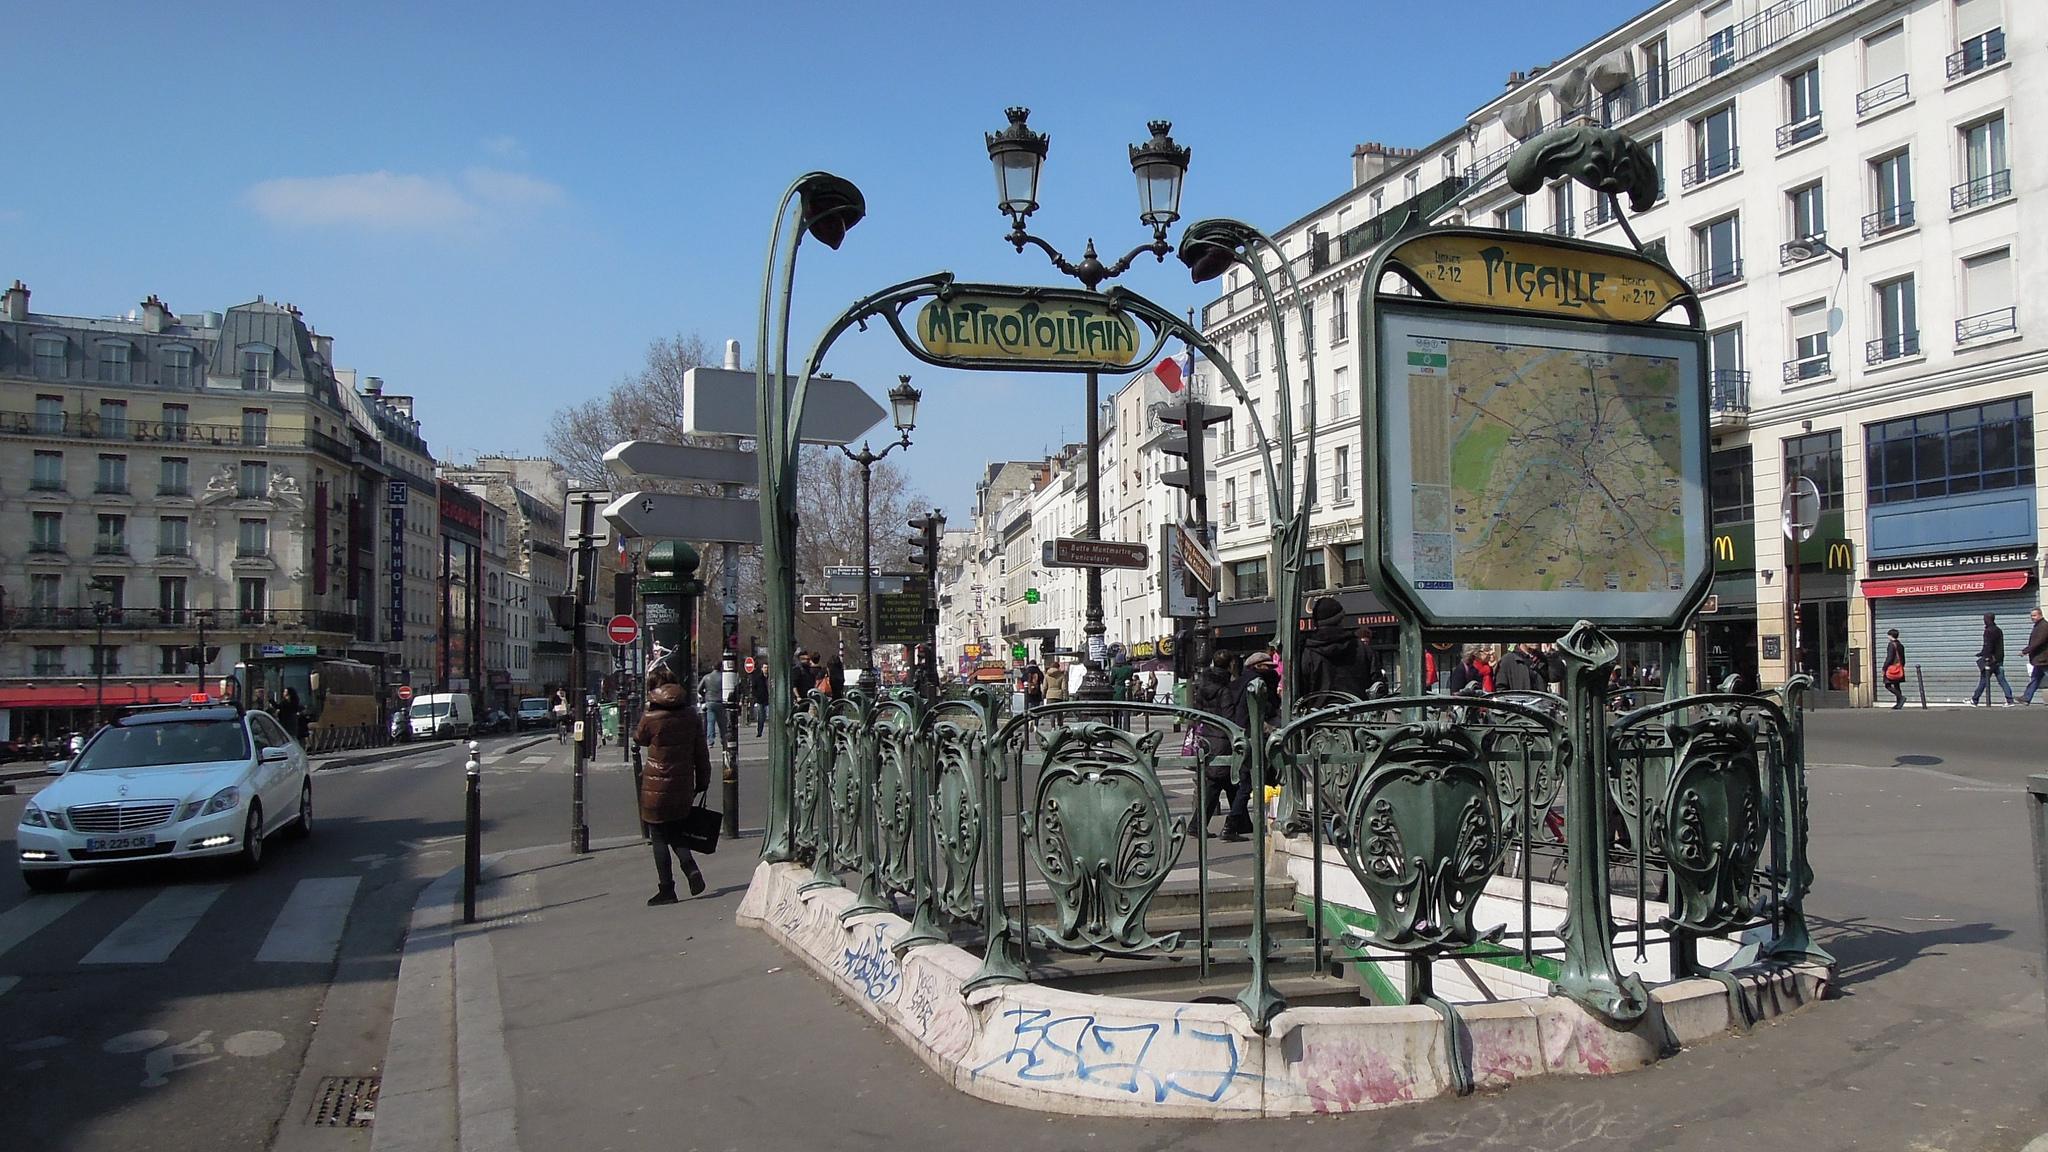 Площадь Пигаль, станция метро